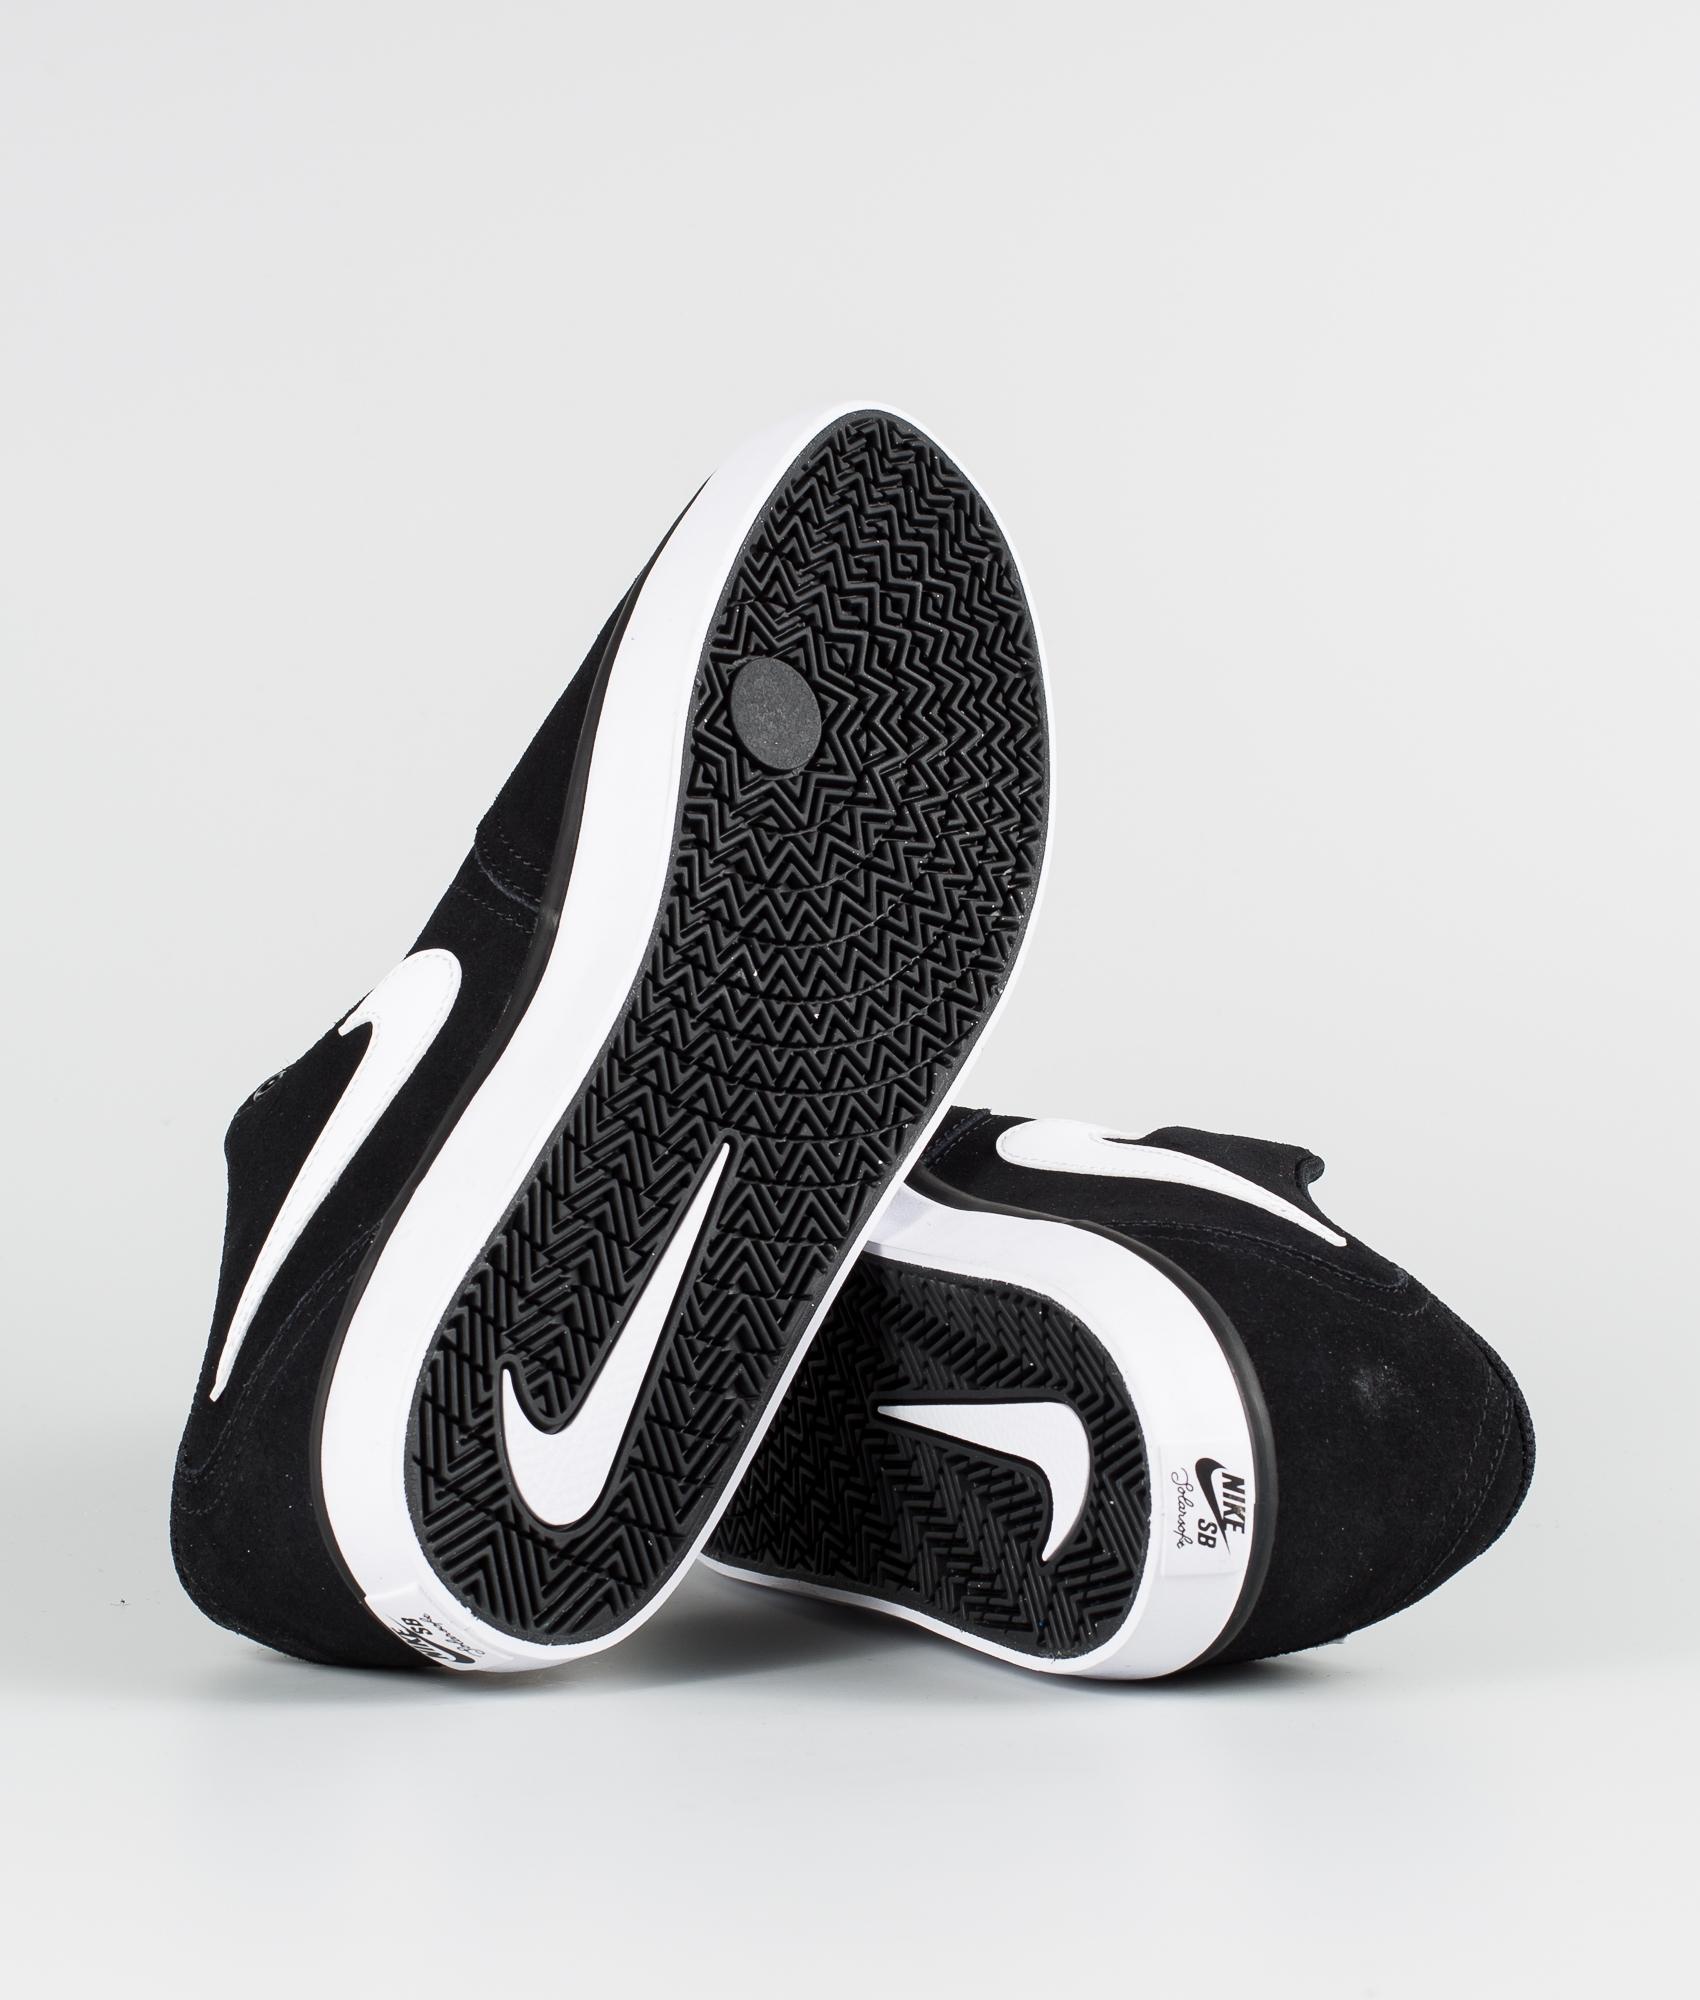 7dd8096eff1cd6 Blackwhite Schuhe Nike Schuhe Check Solar Blackwhite Check Solar Nike  vHAZqEw